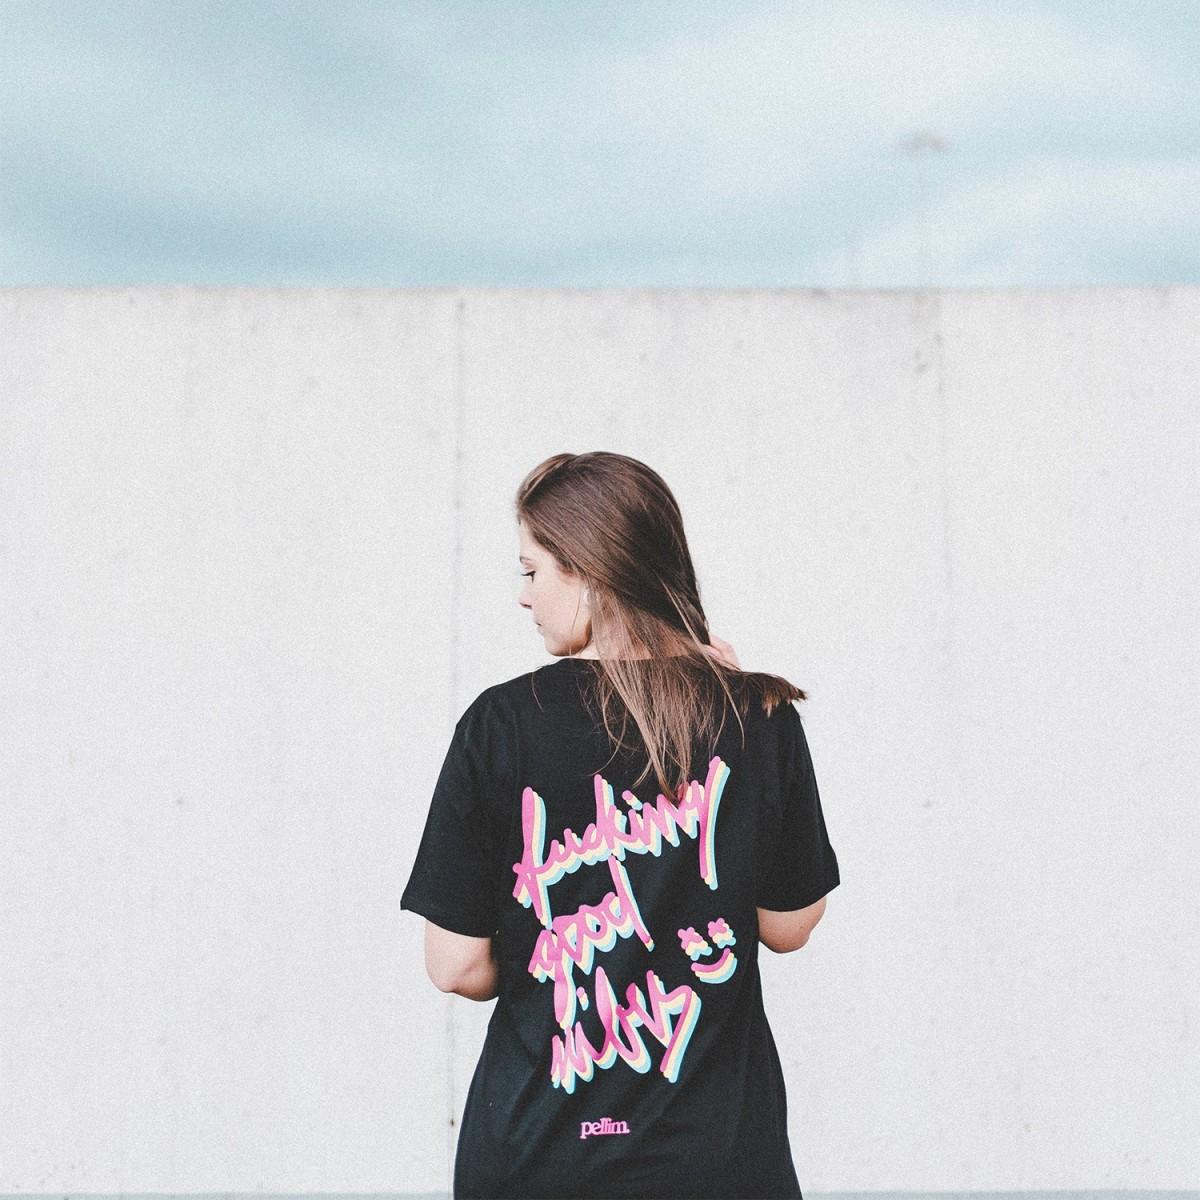 pellim. dizzy shirt black